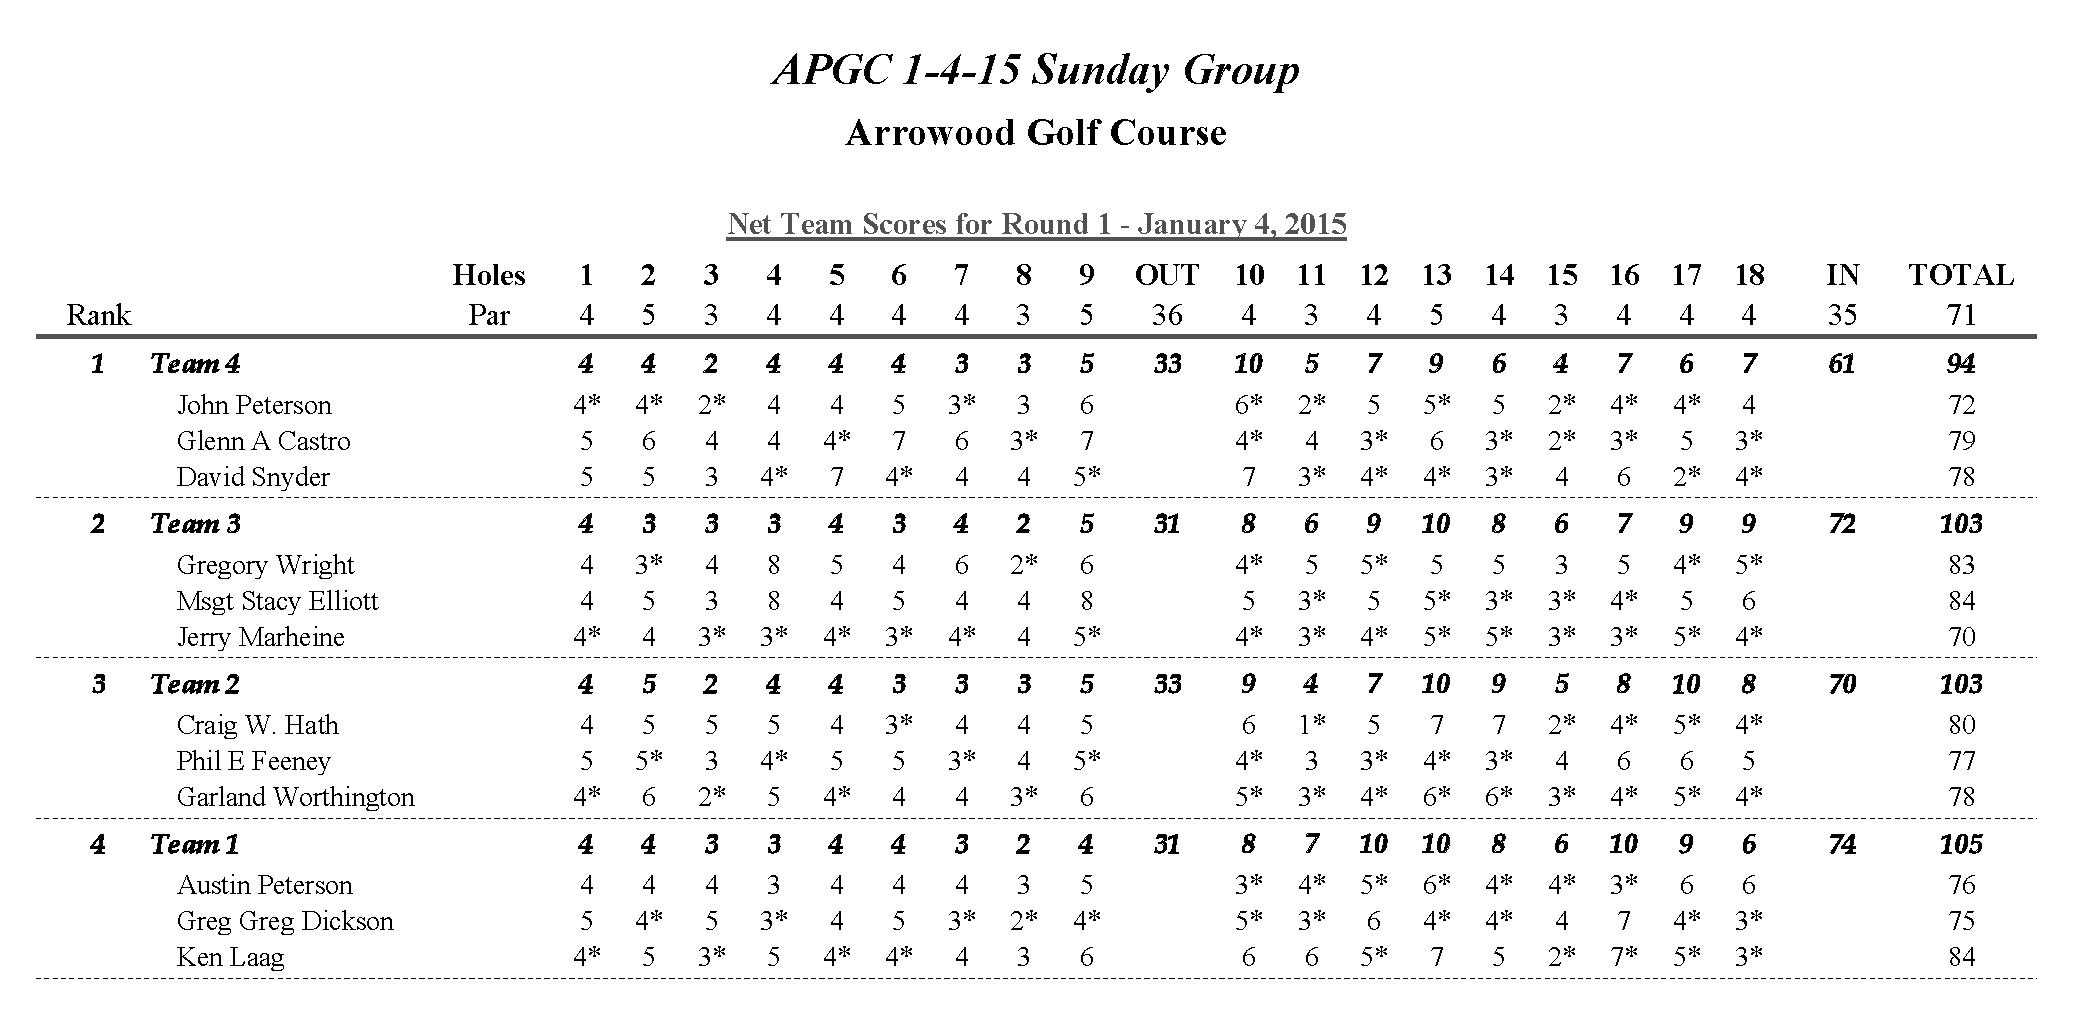 APCG Sunday 1-4-15